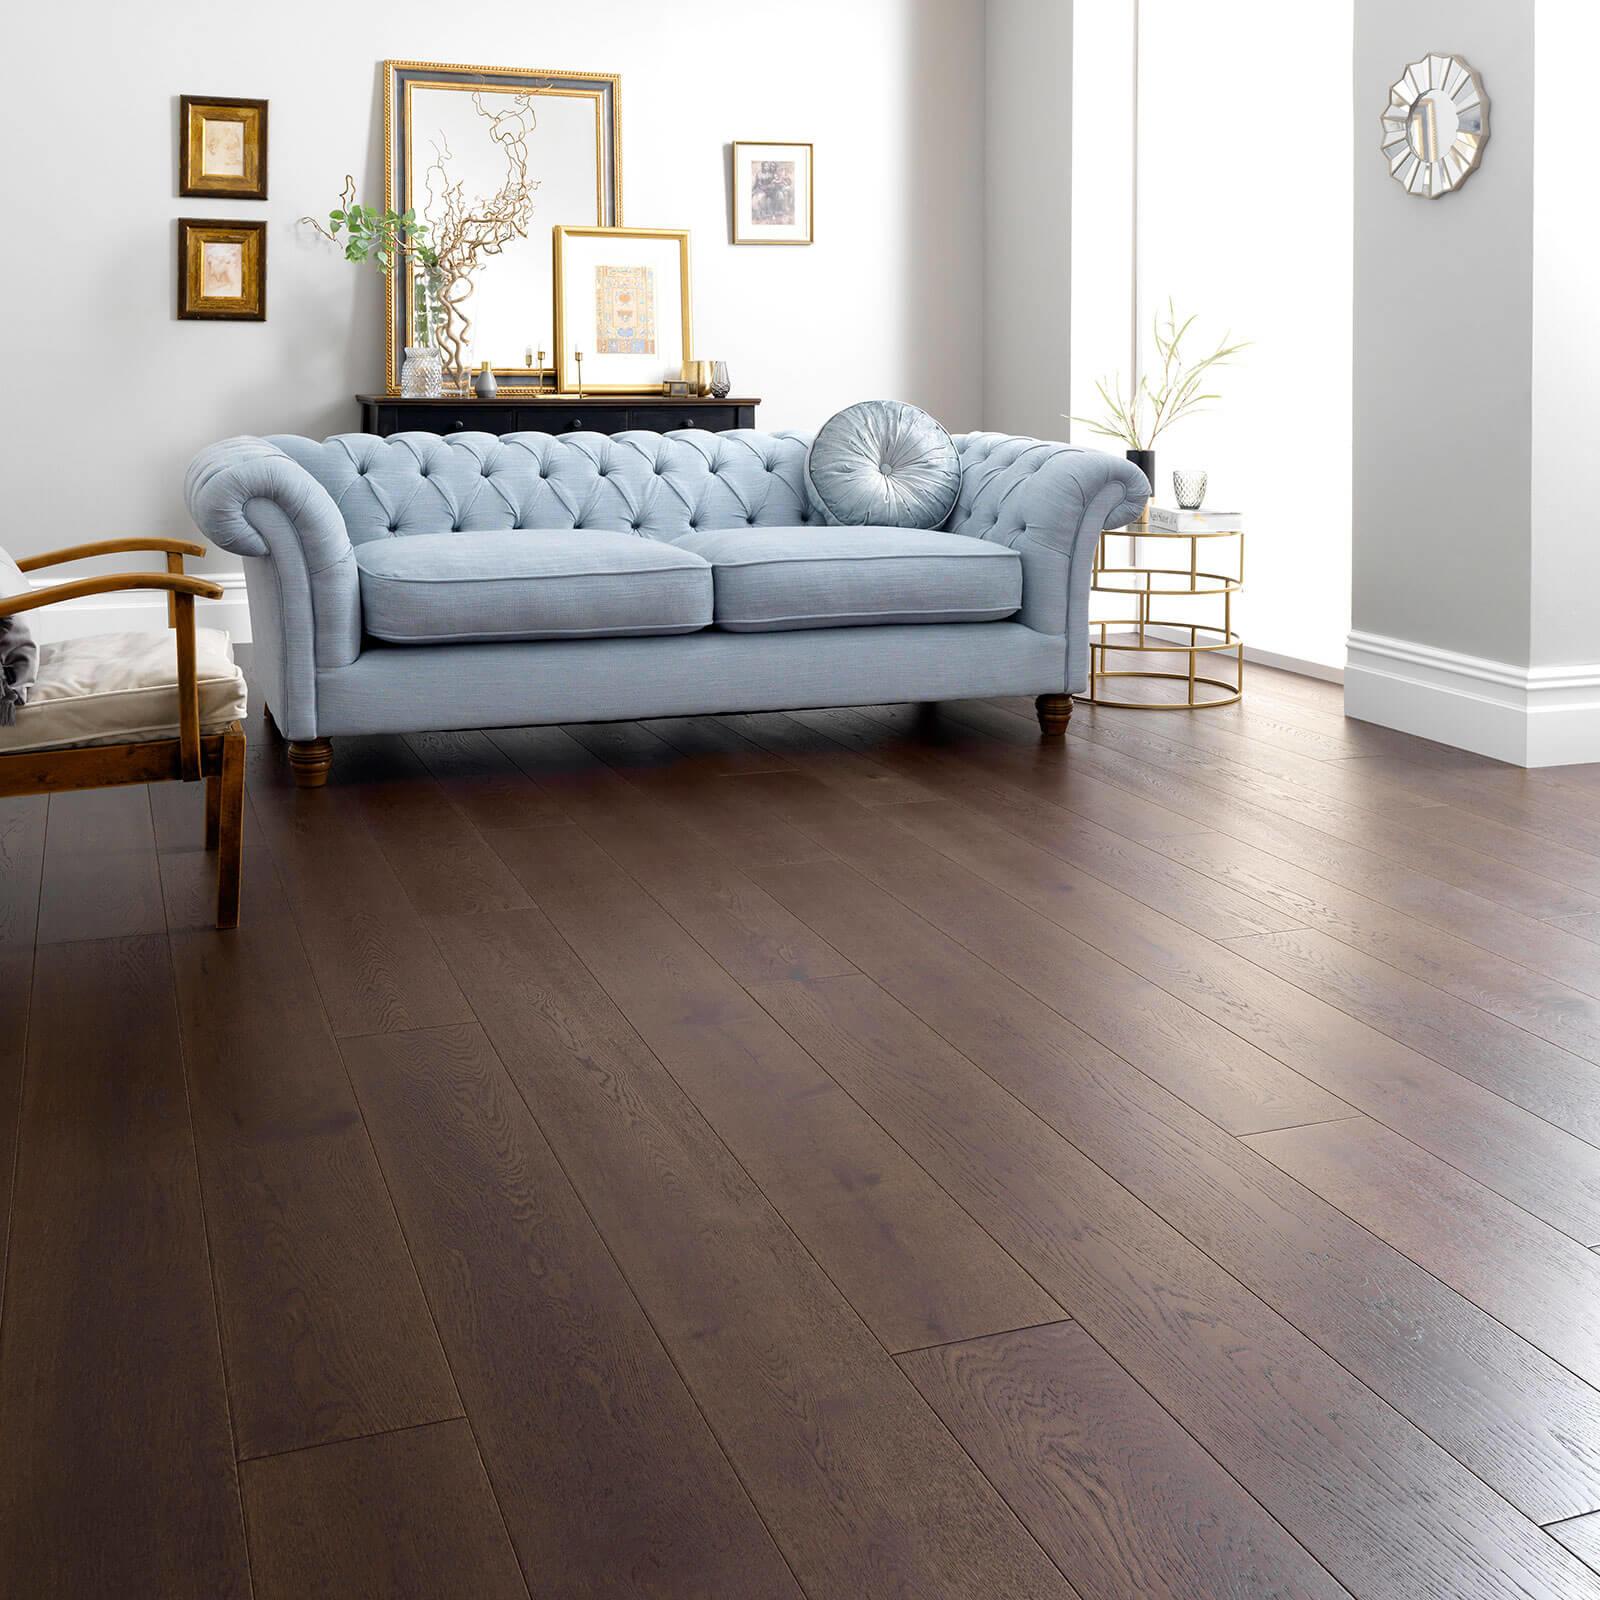 Chocolate Oak Harlech Woodpecker Flooring Lifestyle